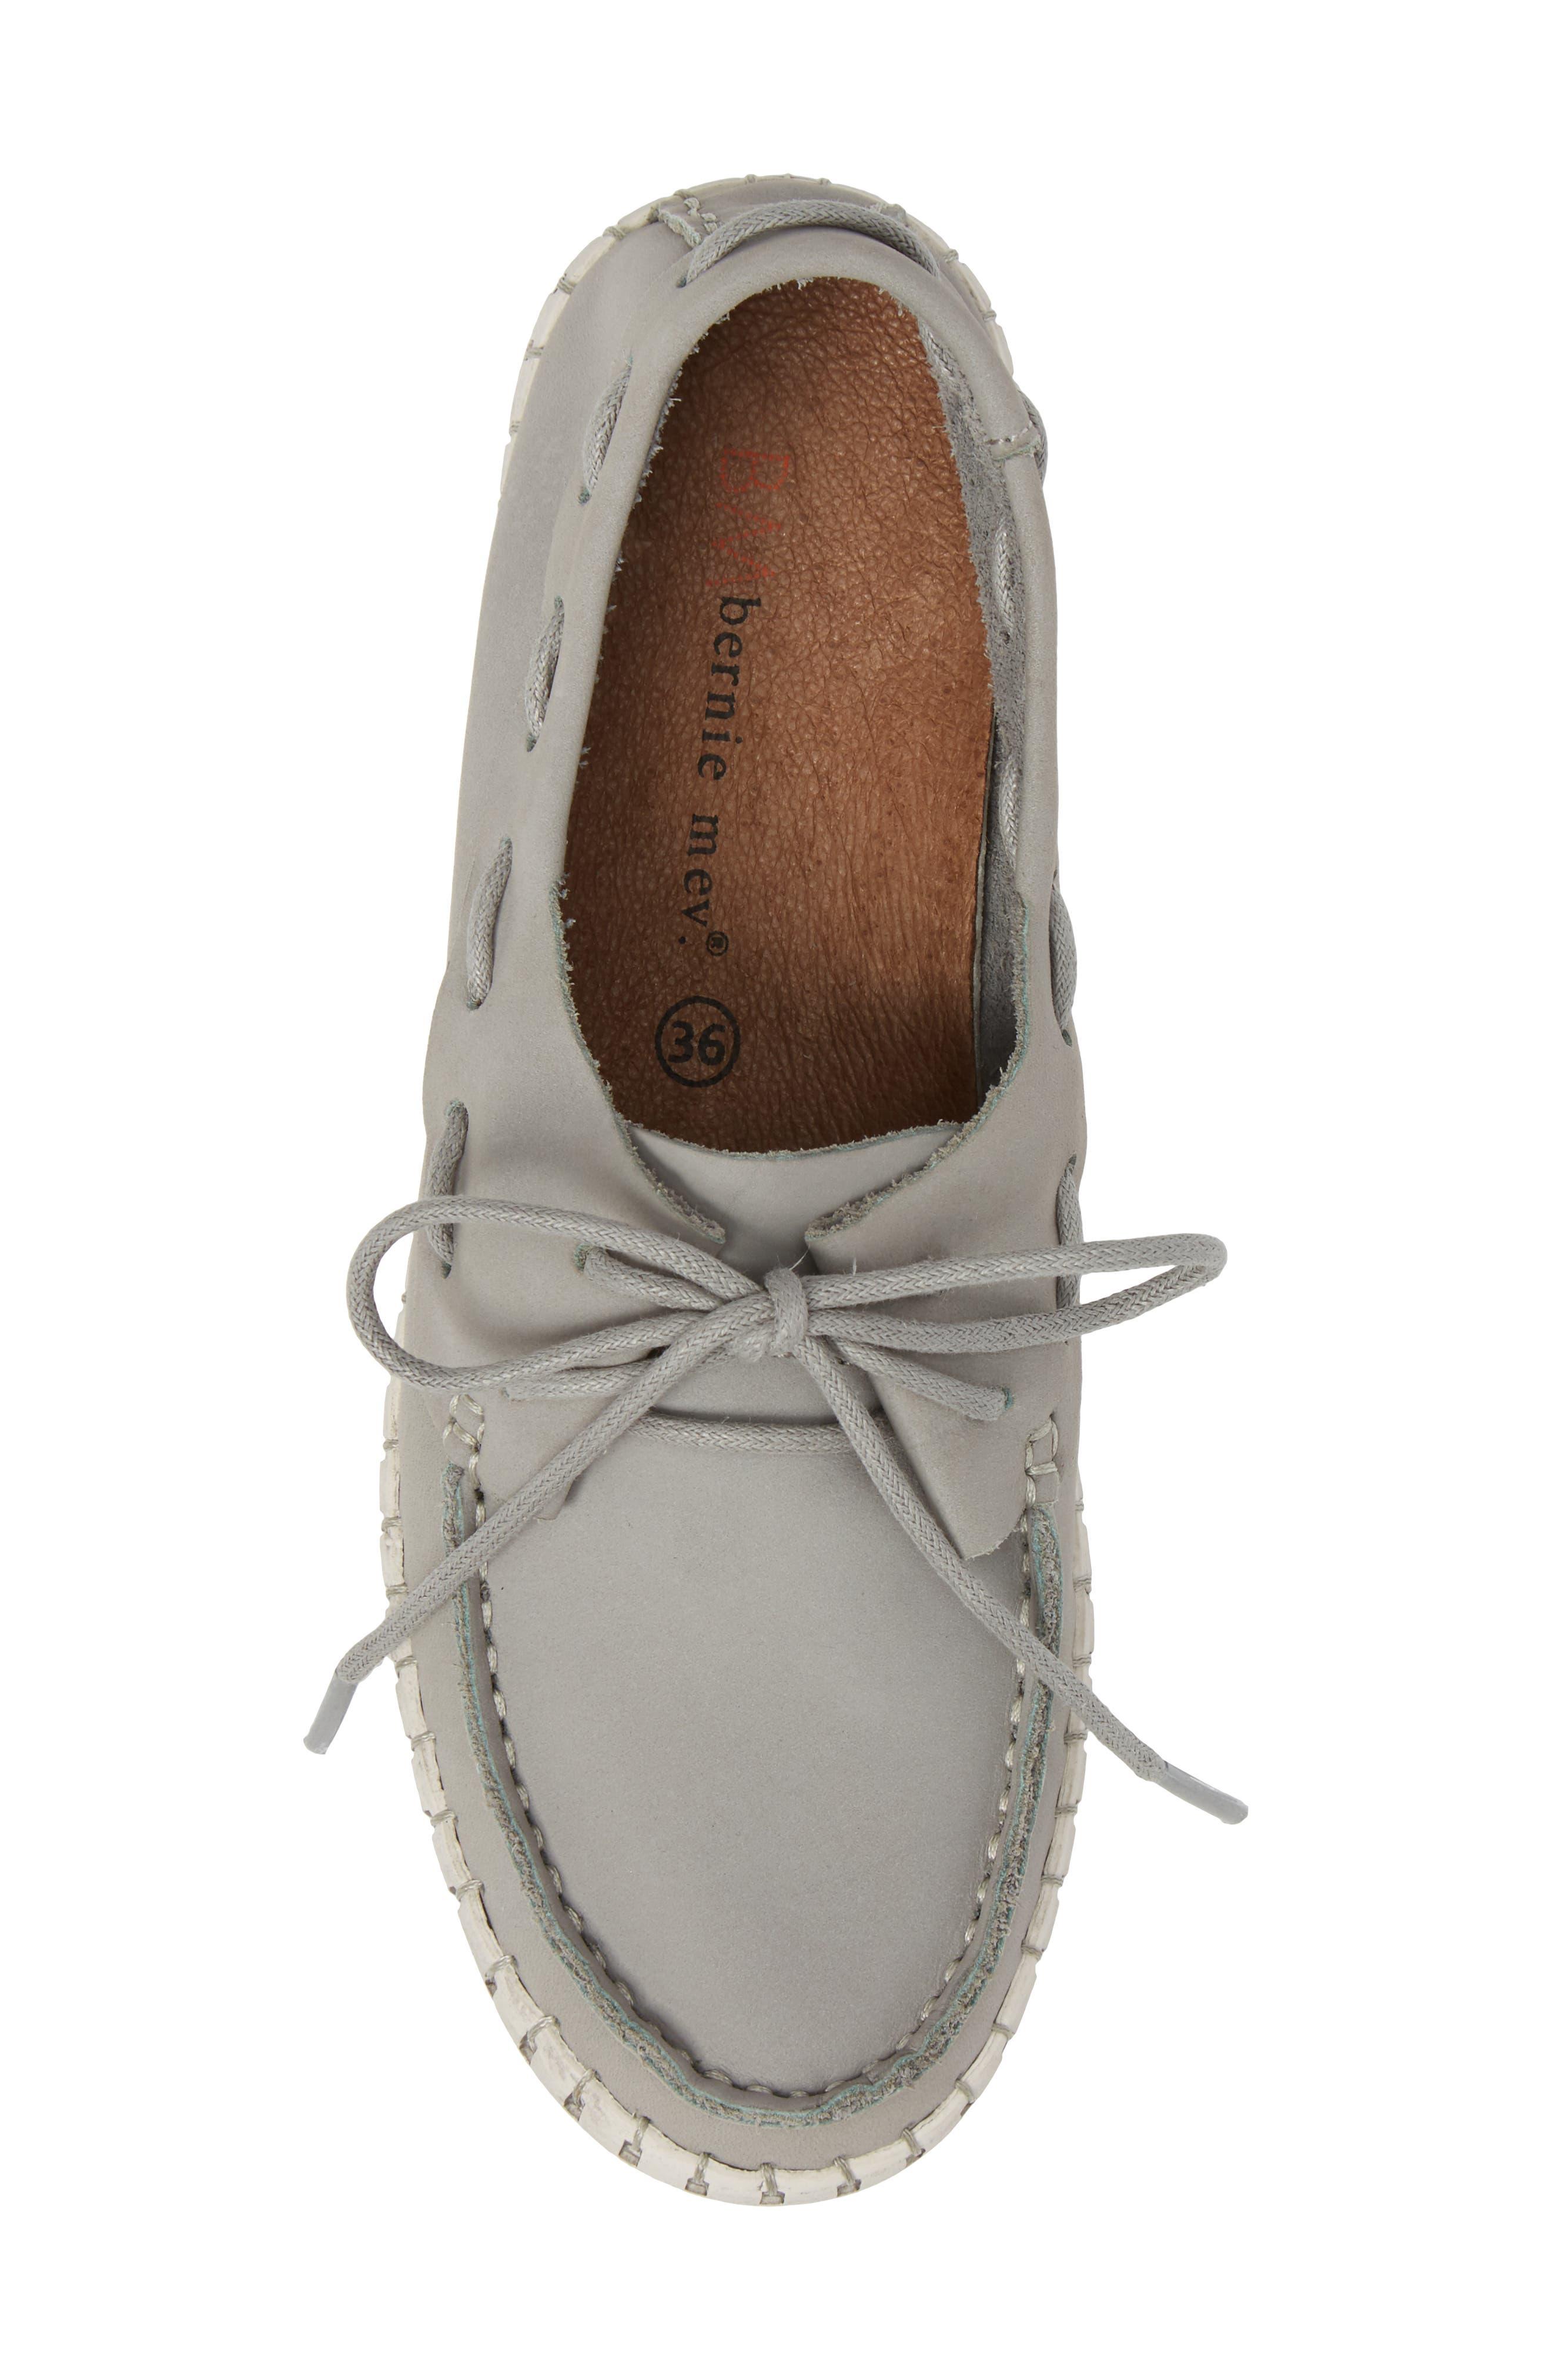 TW41 Boat Shoe,                             Alternate thumbnail 5, color,                             037